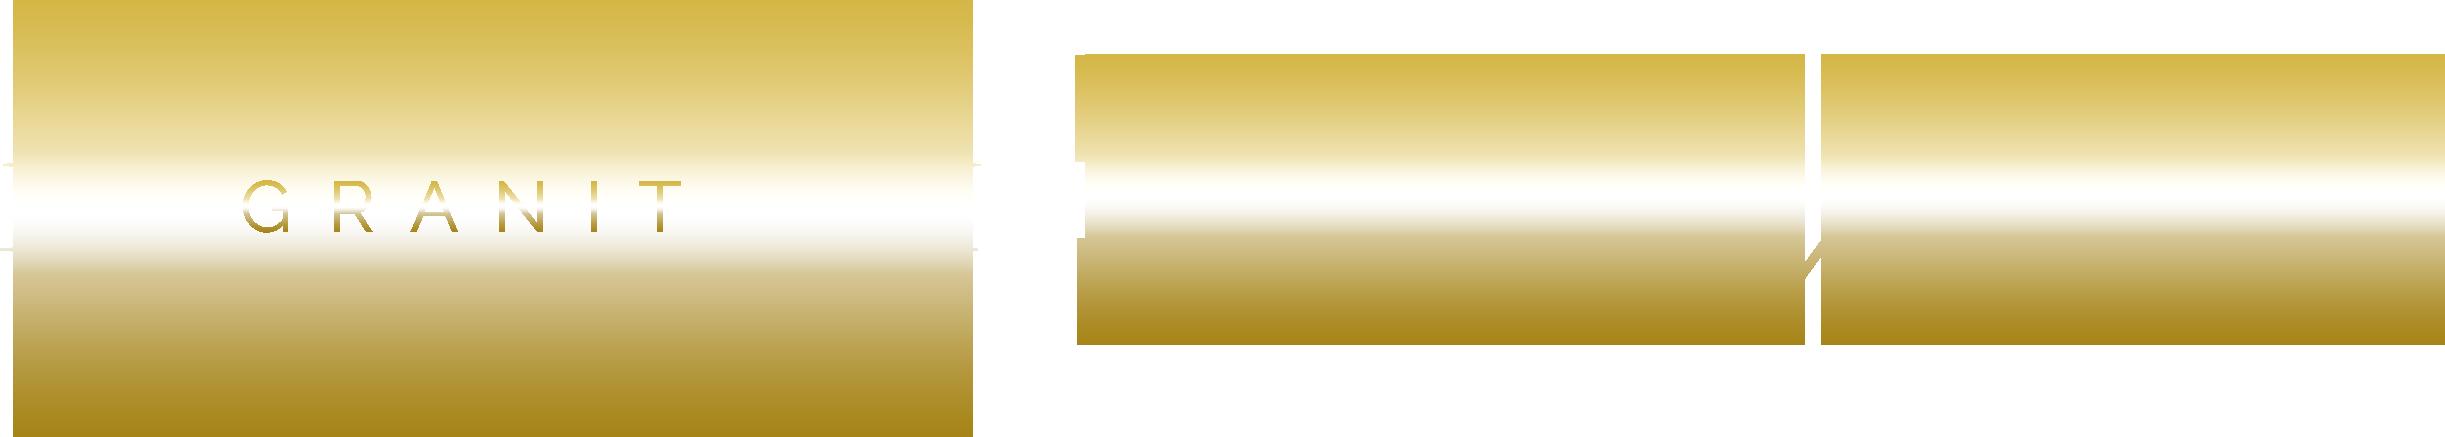 nv_granit